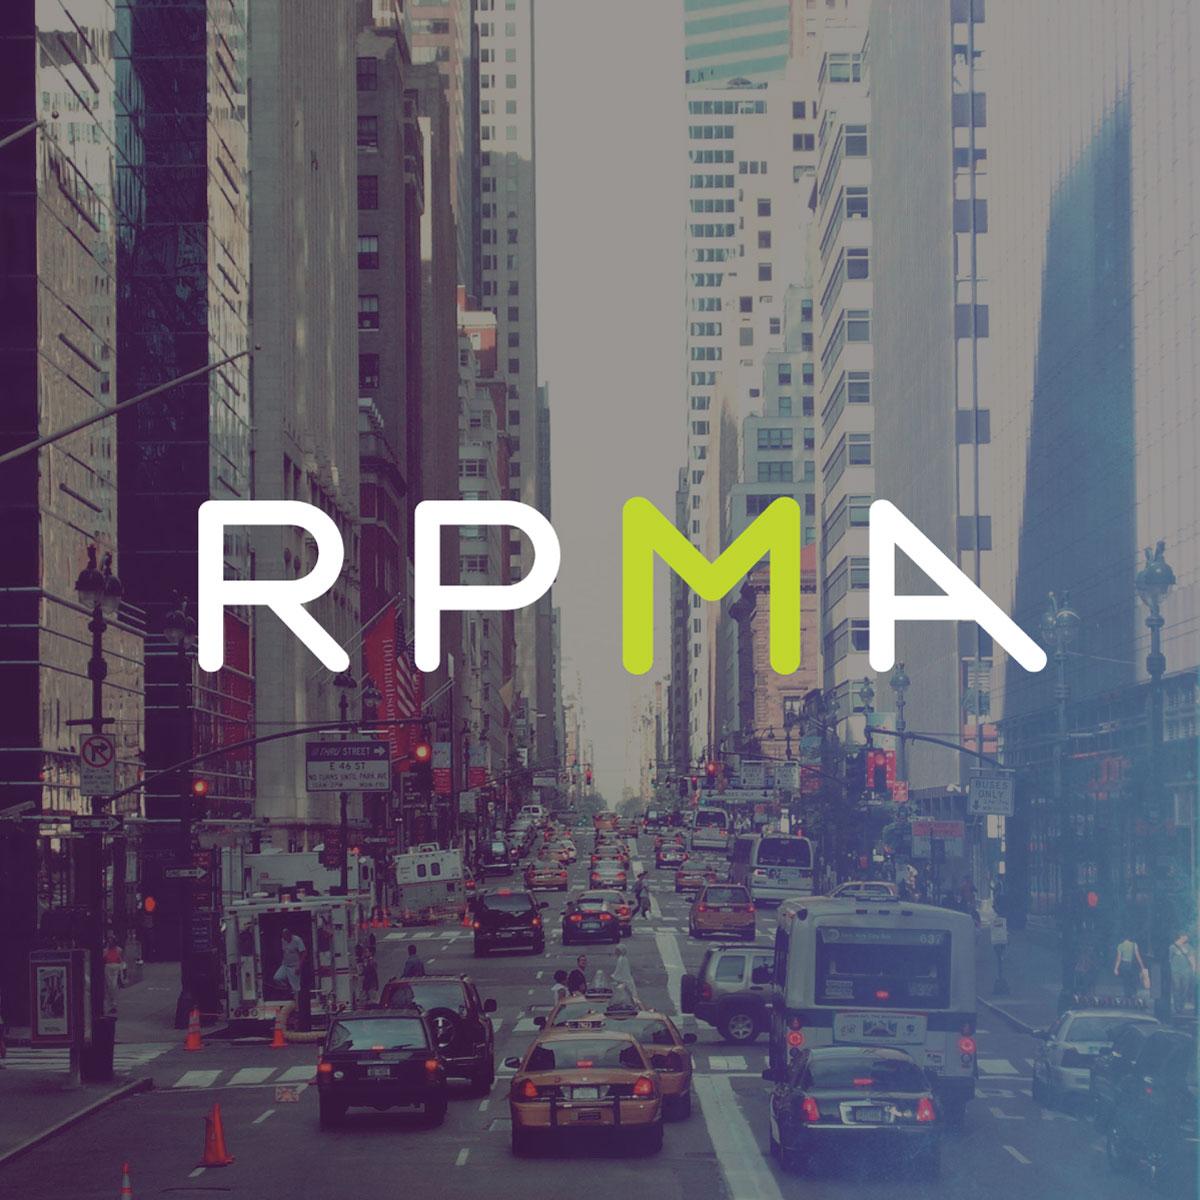 RPMA NYC Interference